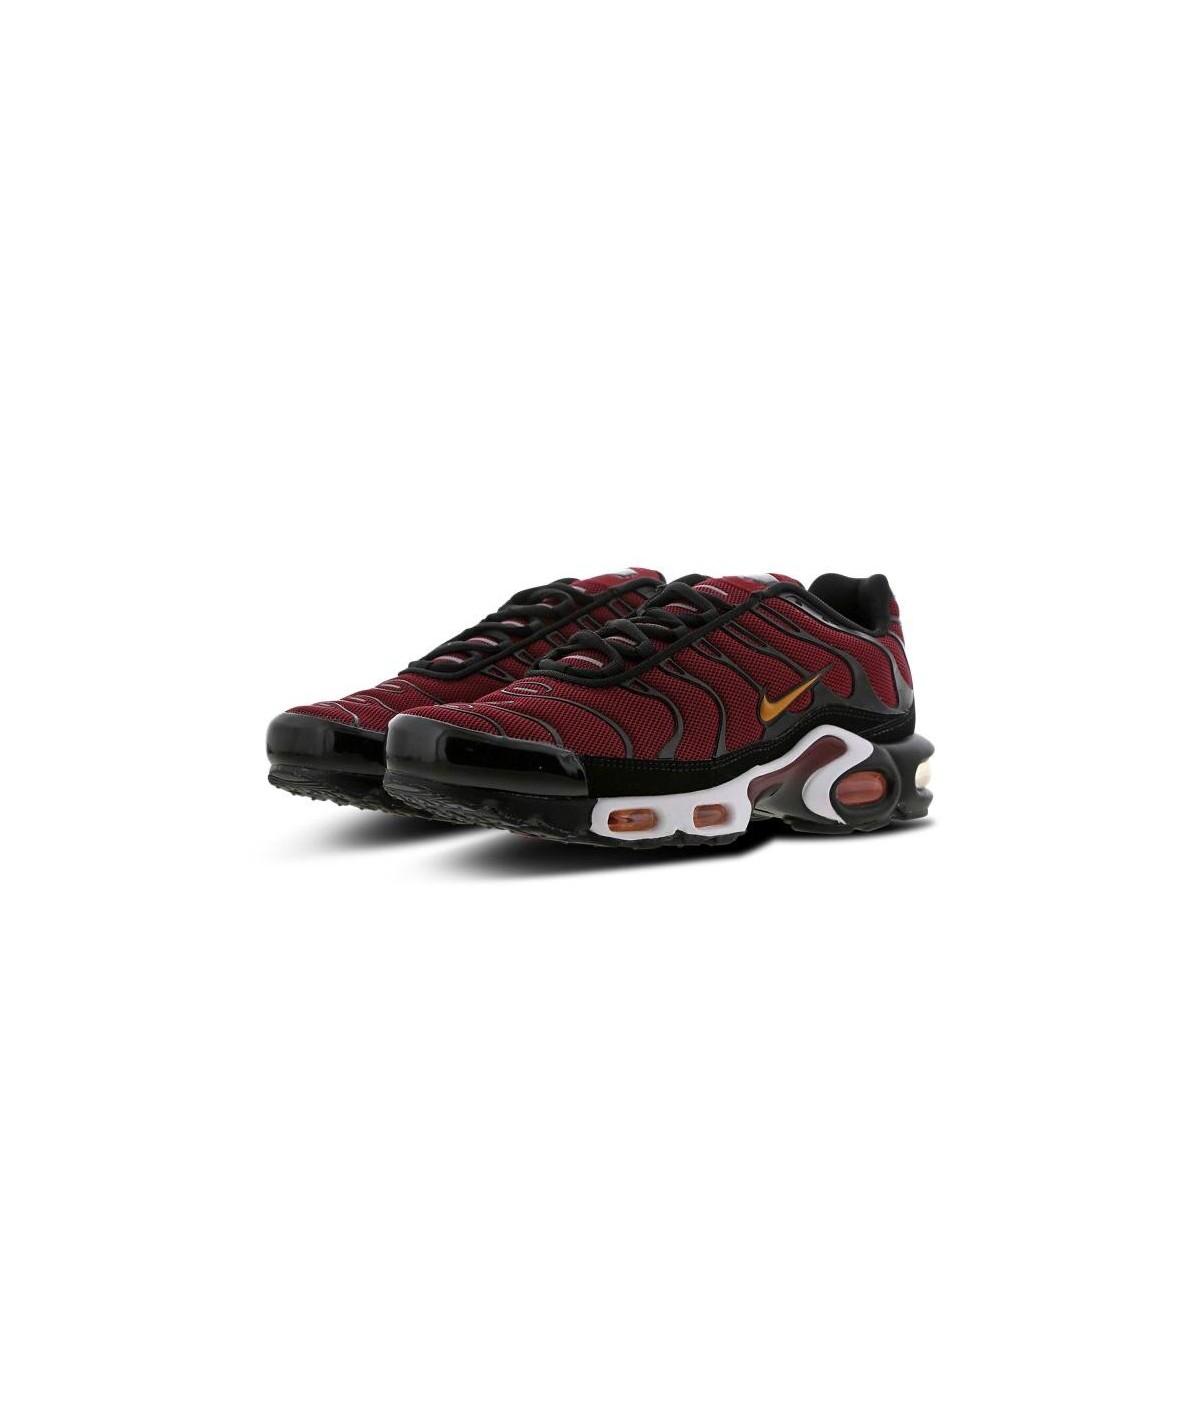 Nike Air Max Plus I Nike Requin I Rouge Bordeaux